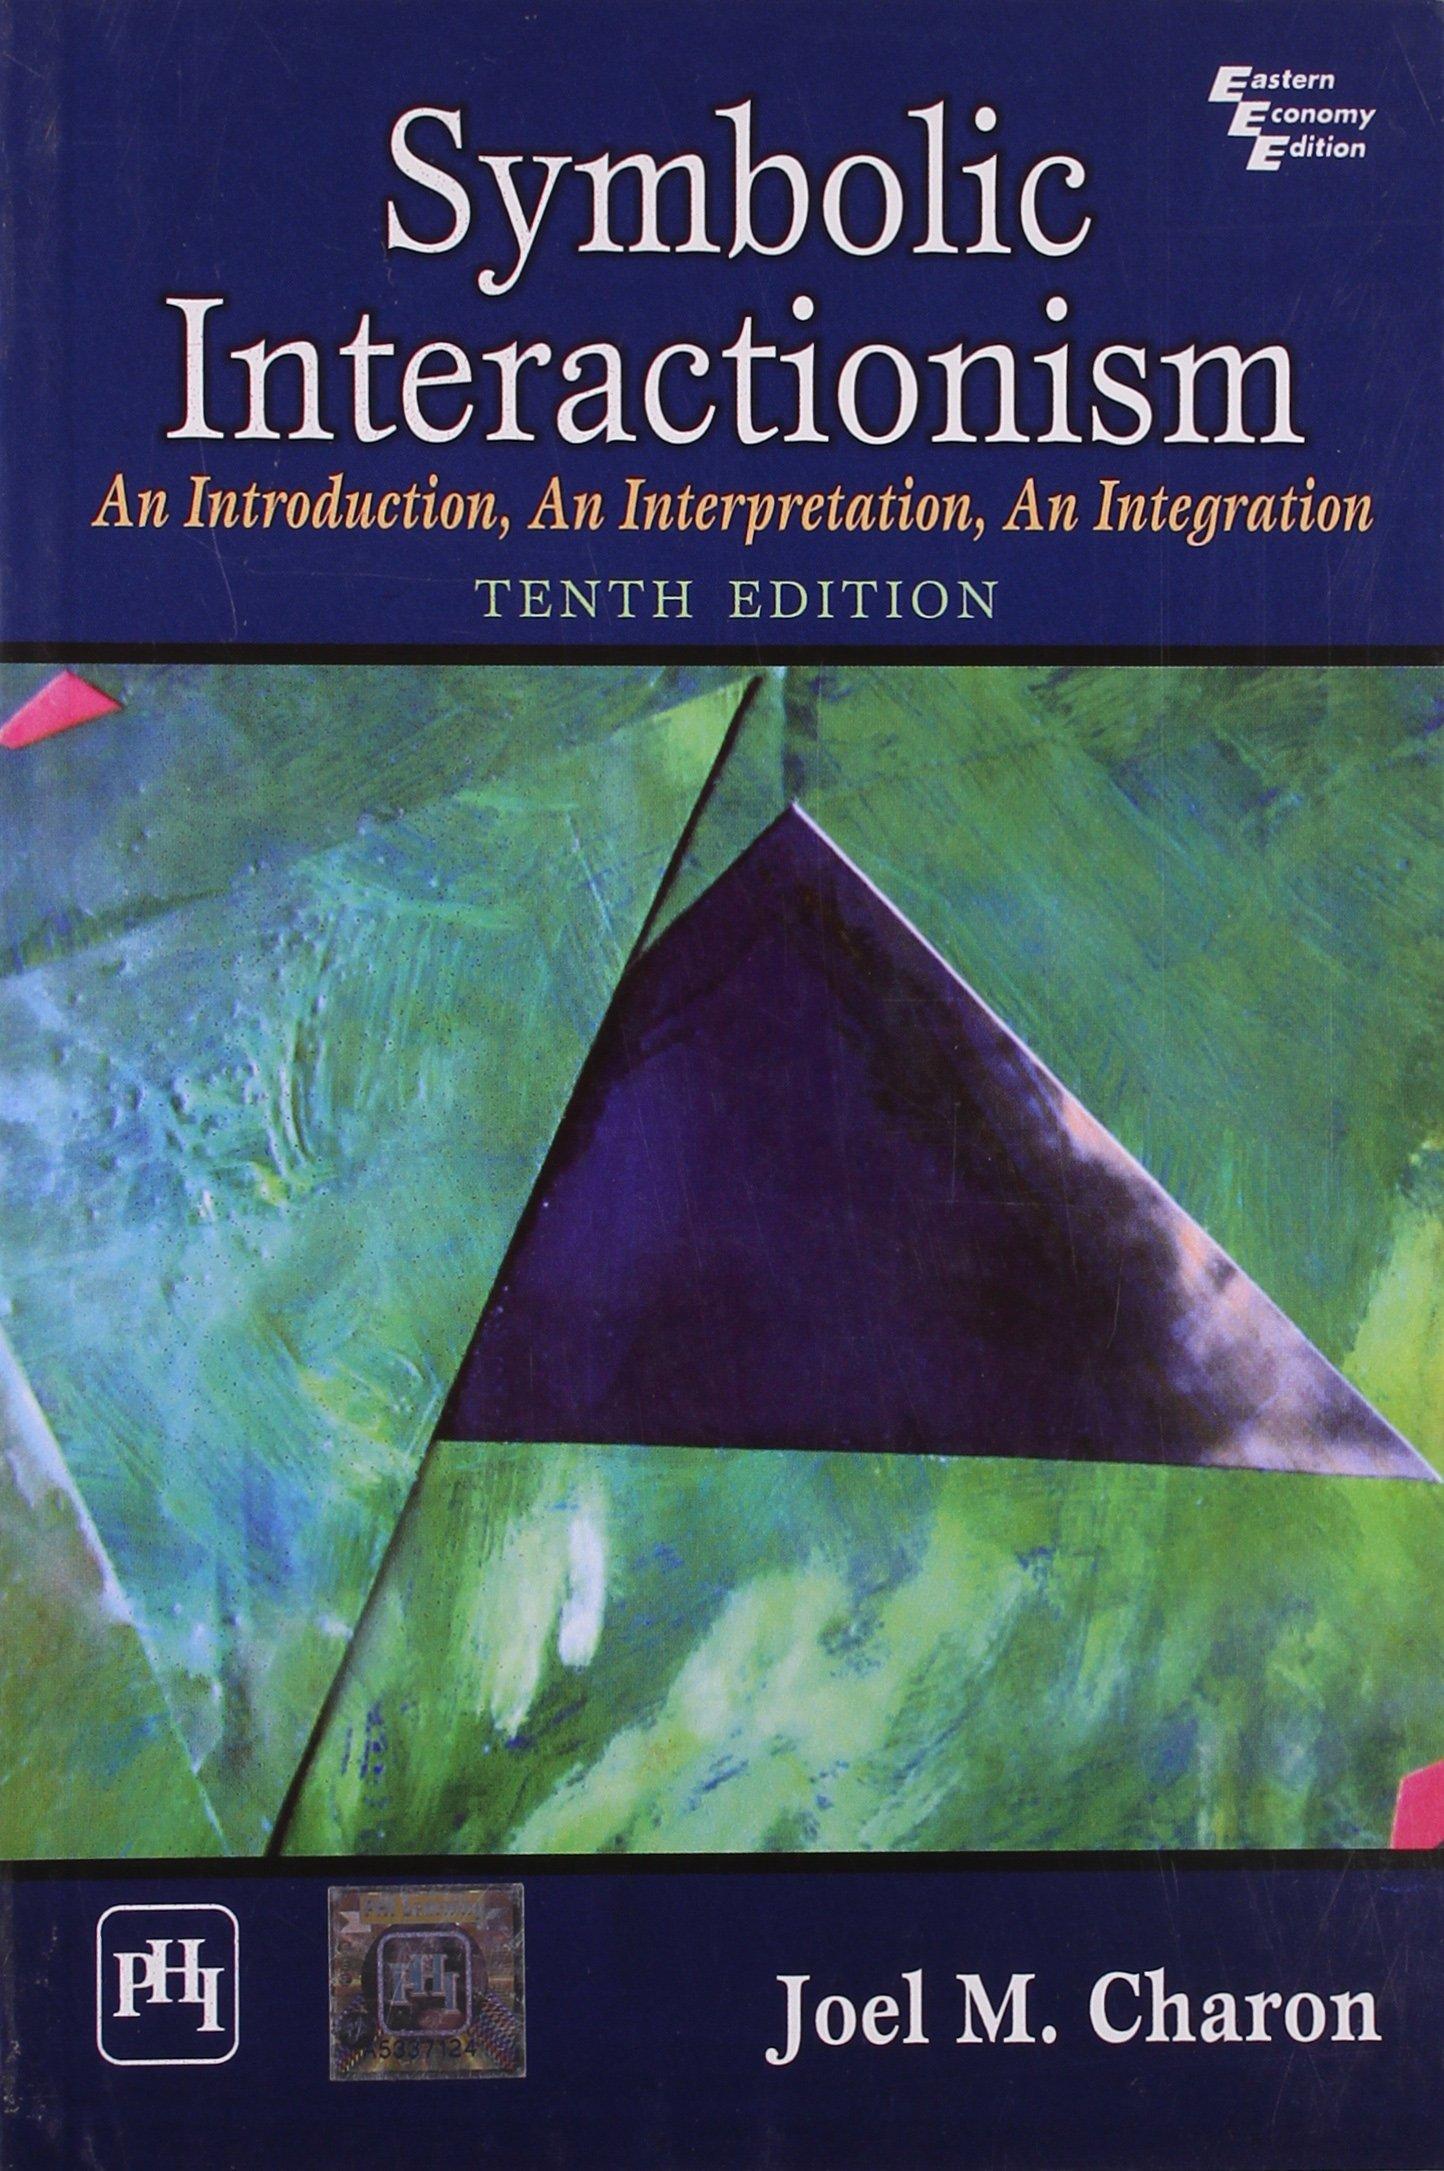 Symbolic interactionism an interpretation an integration 10th symbolic interactionism an interpretation an integration 10th ed joel m charon 9788120343474 amazon books biocorpaavc Image collections